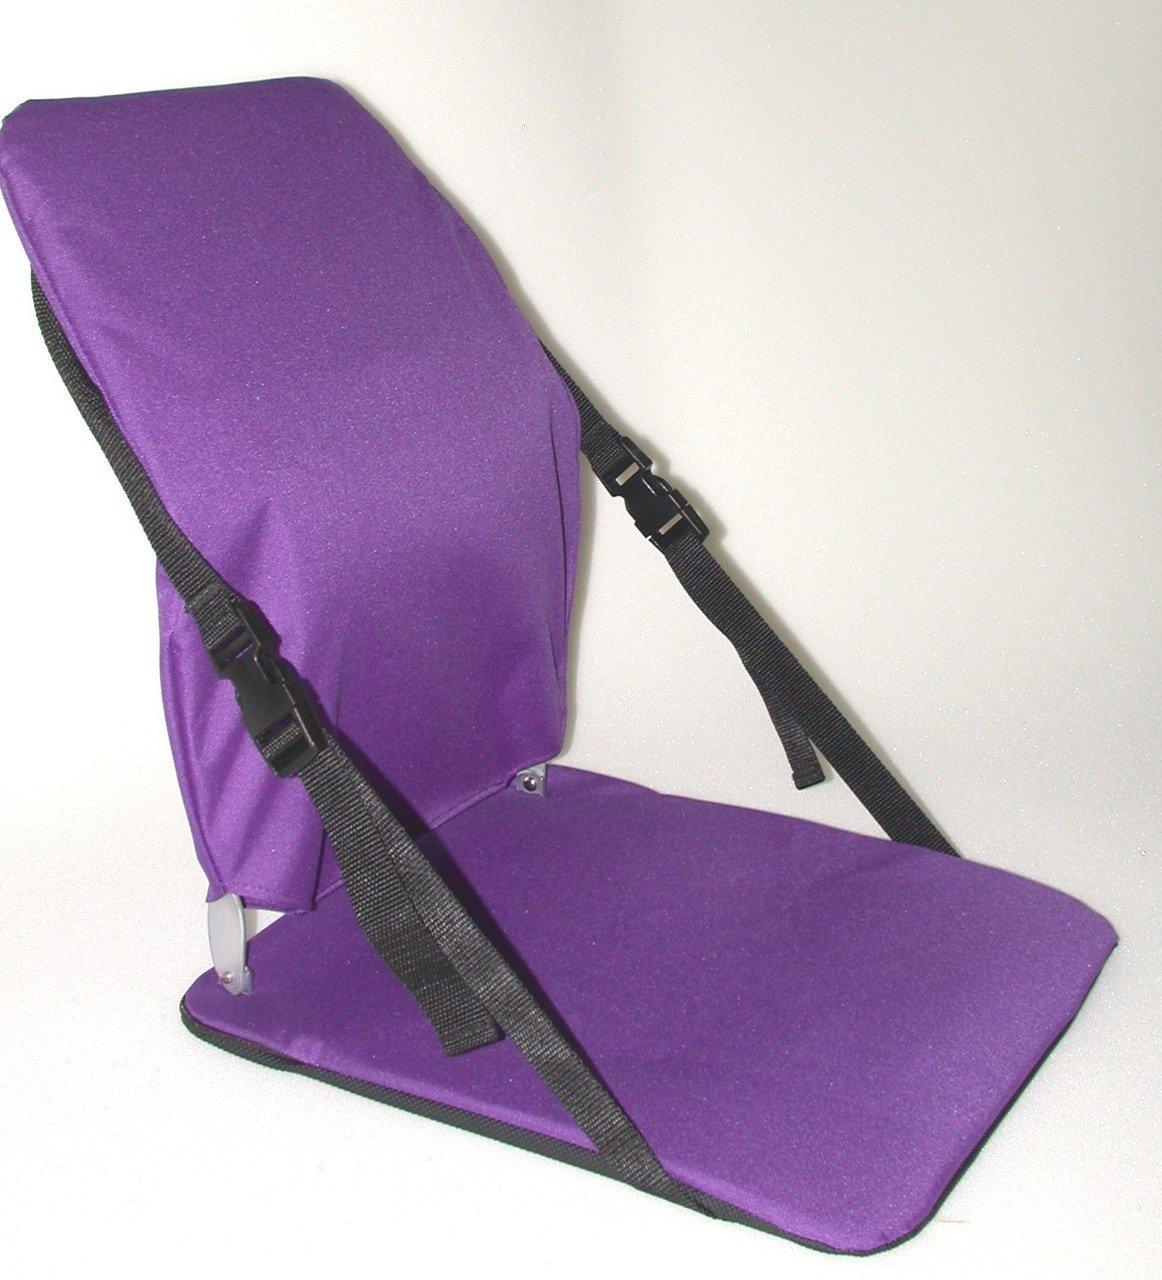 McCarty's Sacro Ease Portable Bleacher Stadium Cushion PURPLE